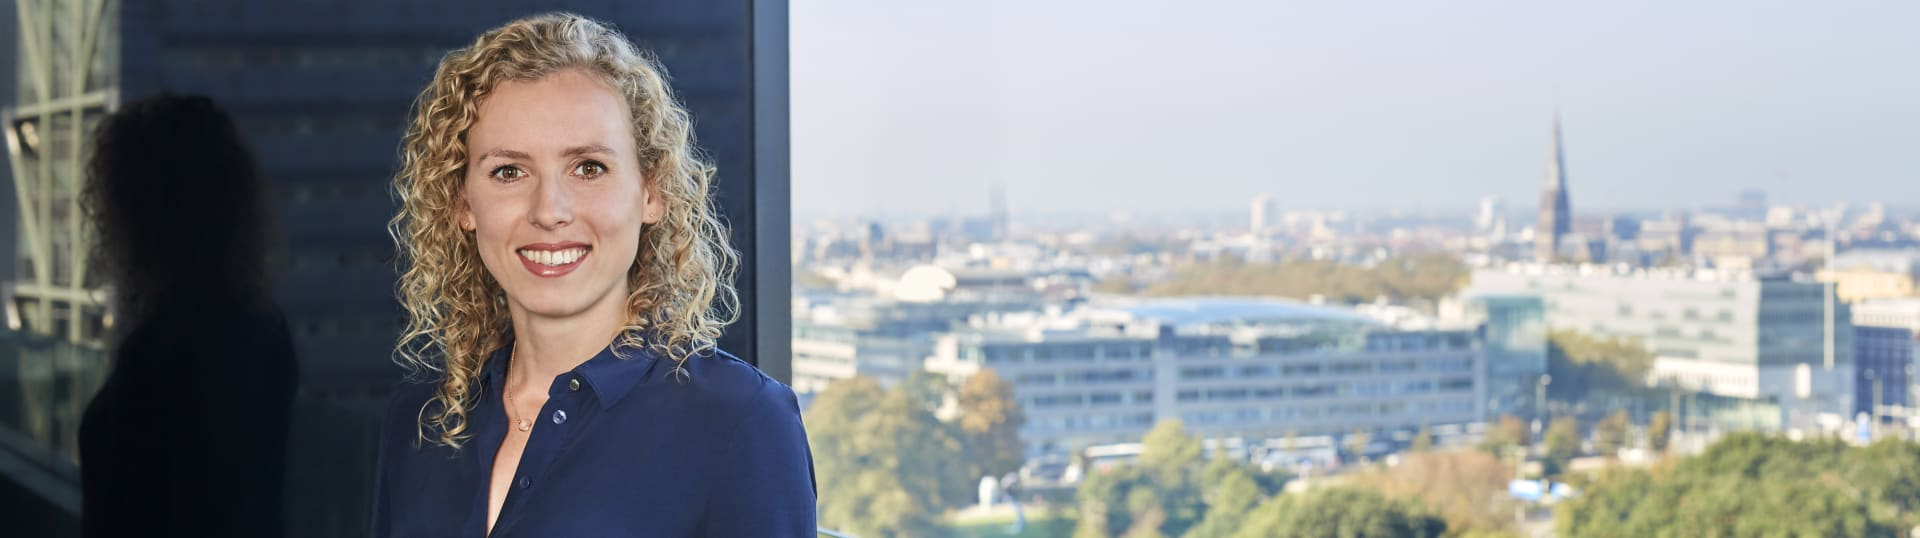 Freke Streng, advocaat Pels Rijcken